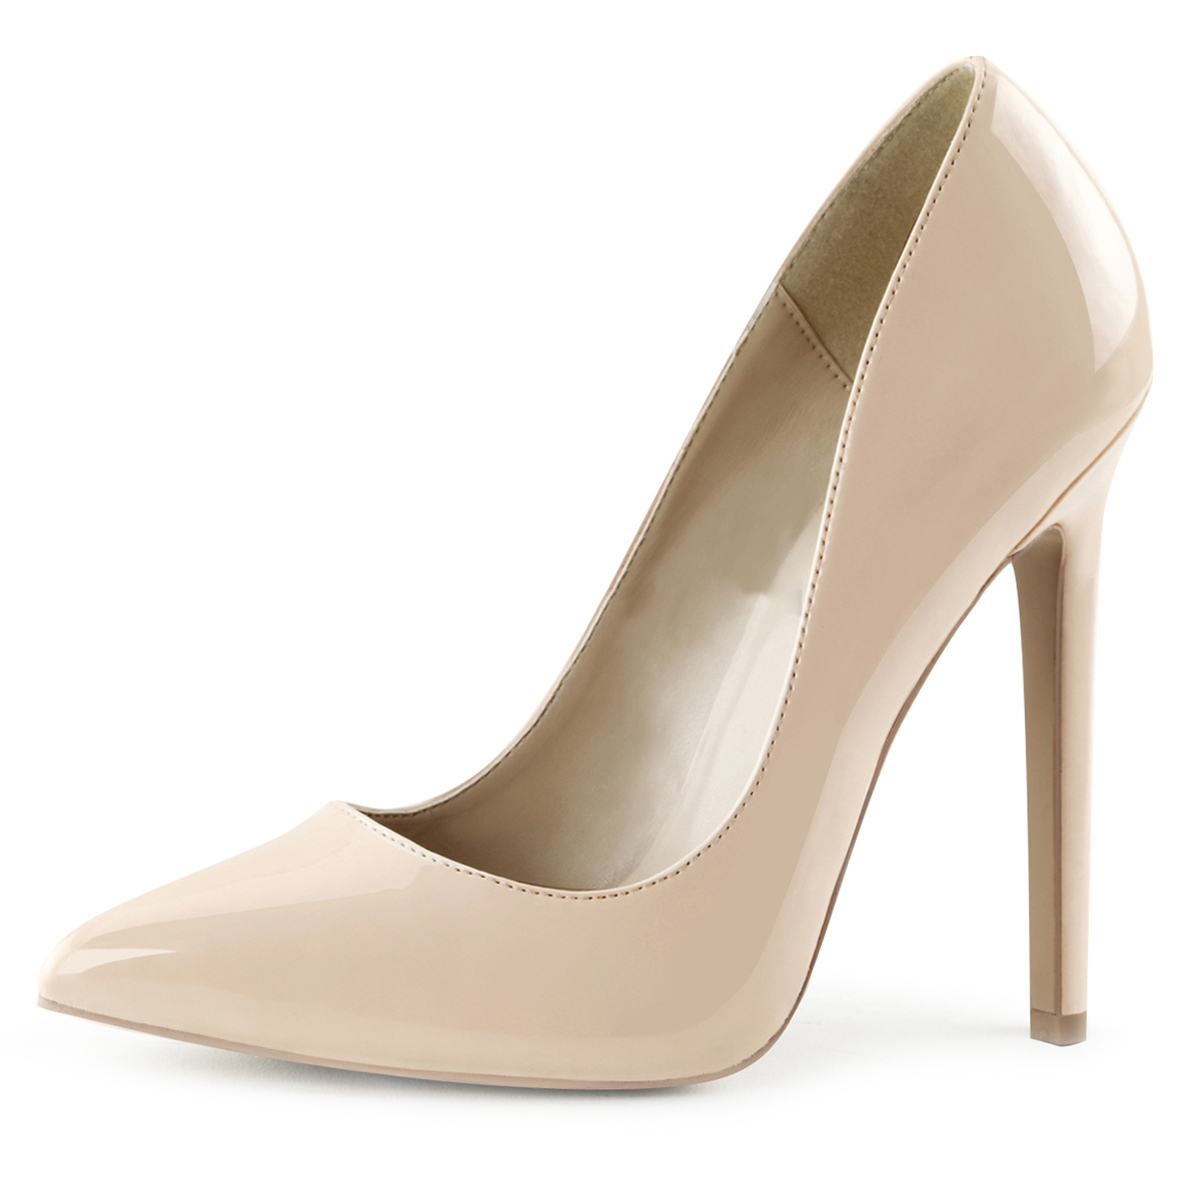 how to wear 5 inch heels